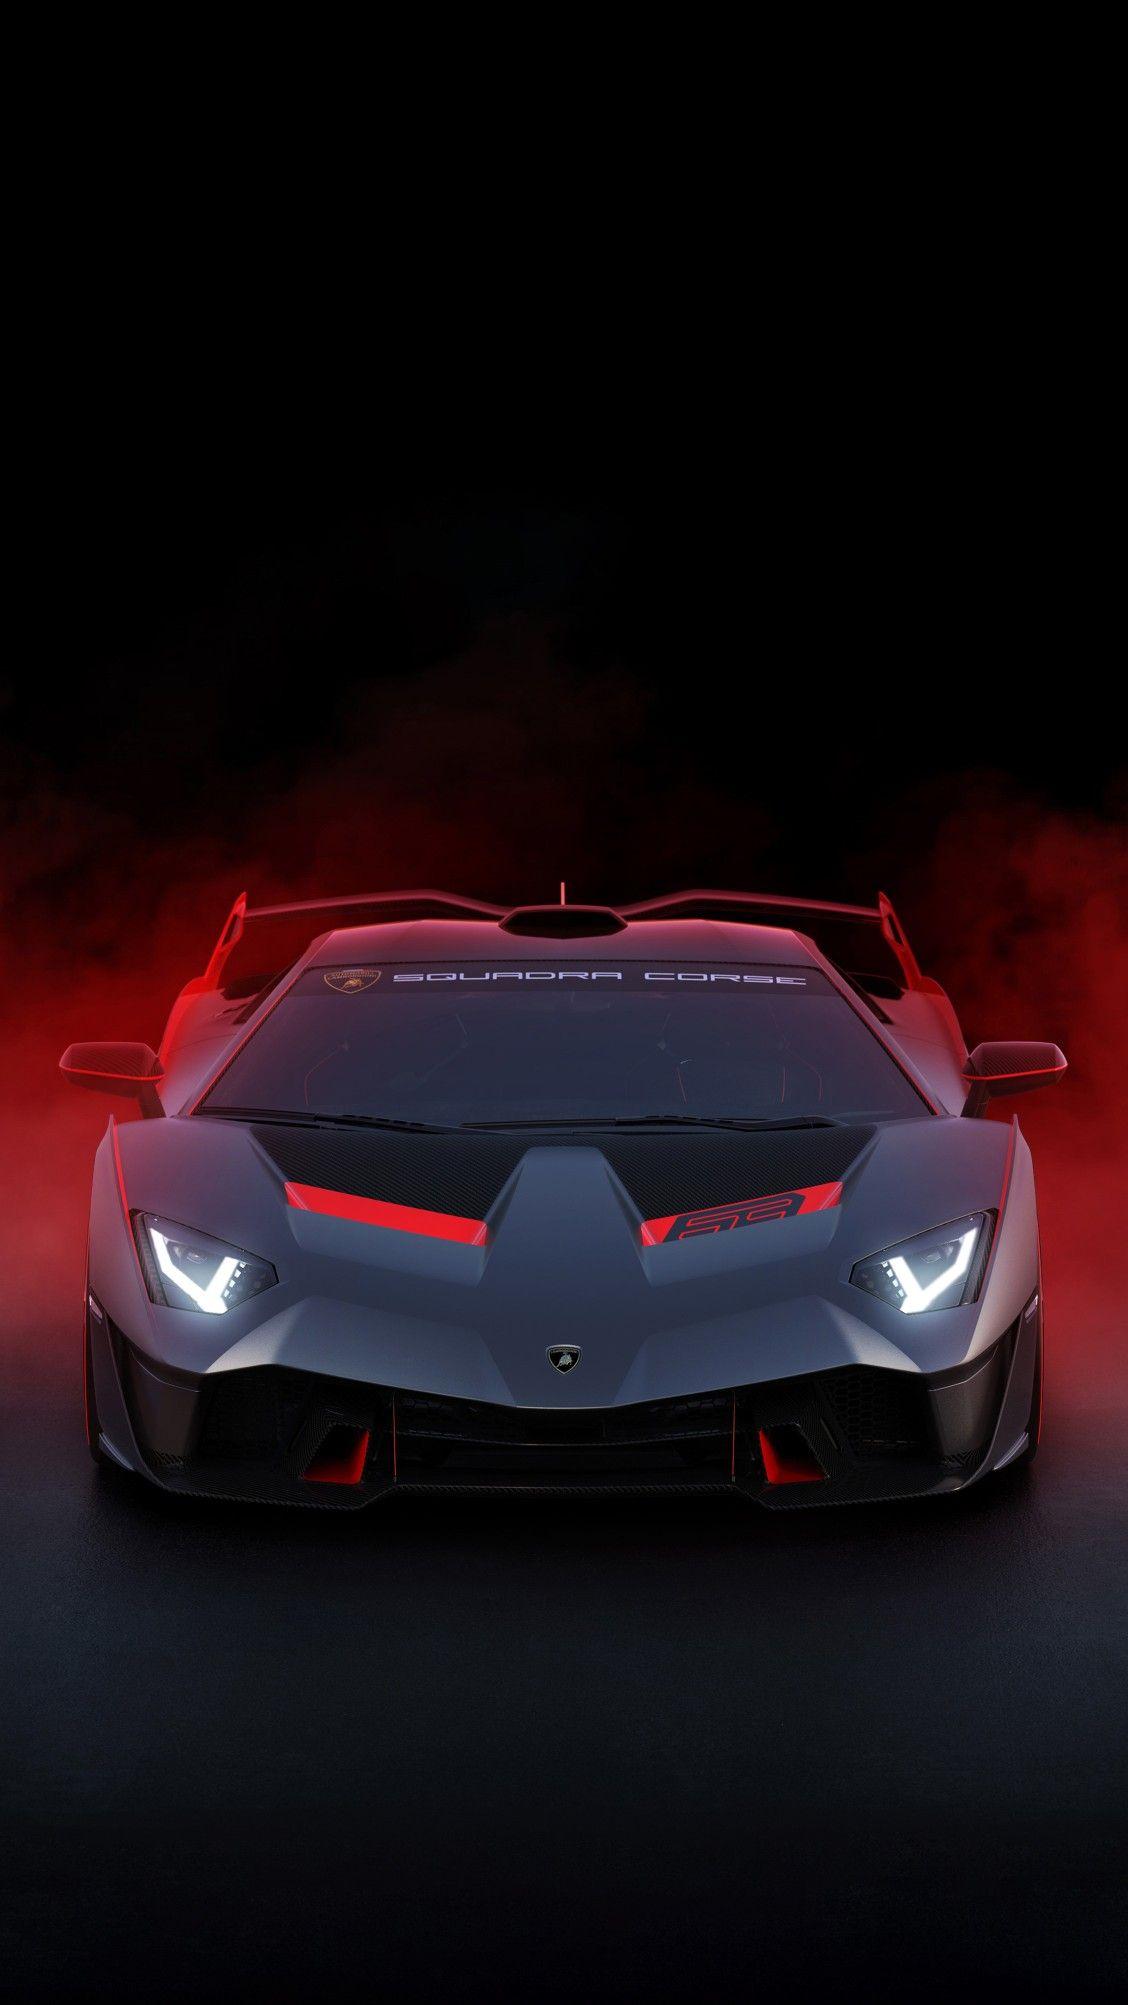 Het Is Een Mooie Rode Auto Super Cars Super Luxury Cars Lamborghini Cars